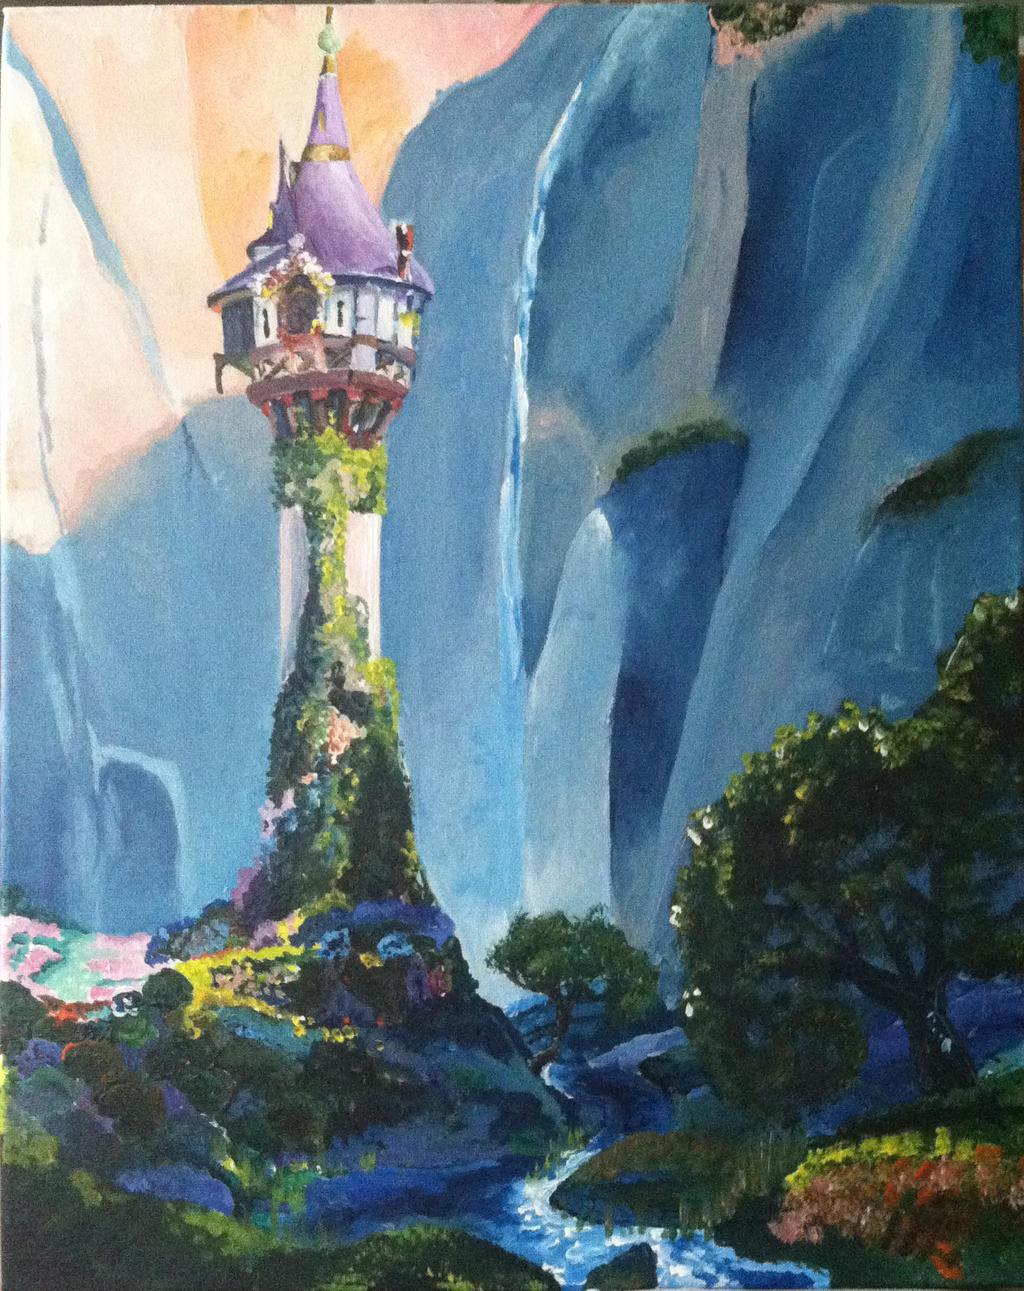 Rapunzel Bedroom Tangled Rapunzel S Tower By Nightsevera On Deviantart